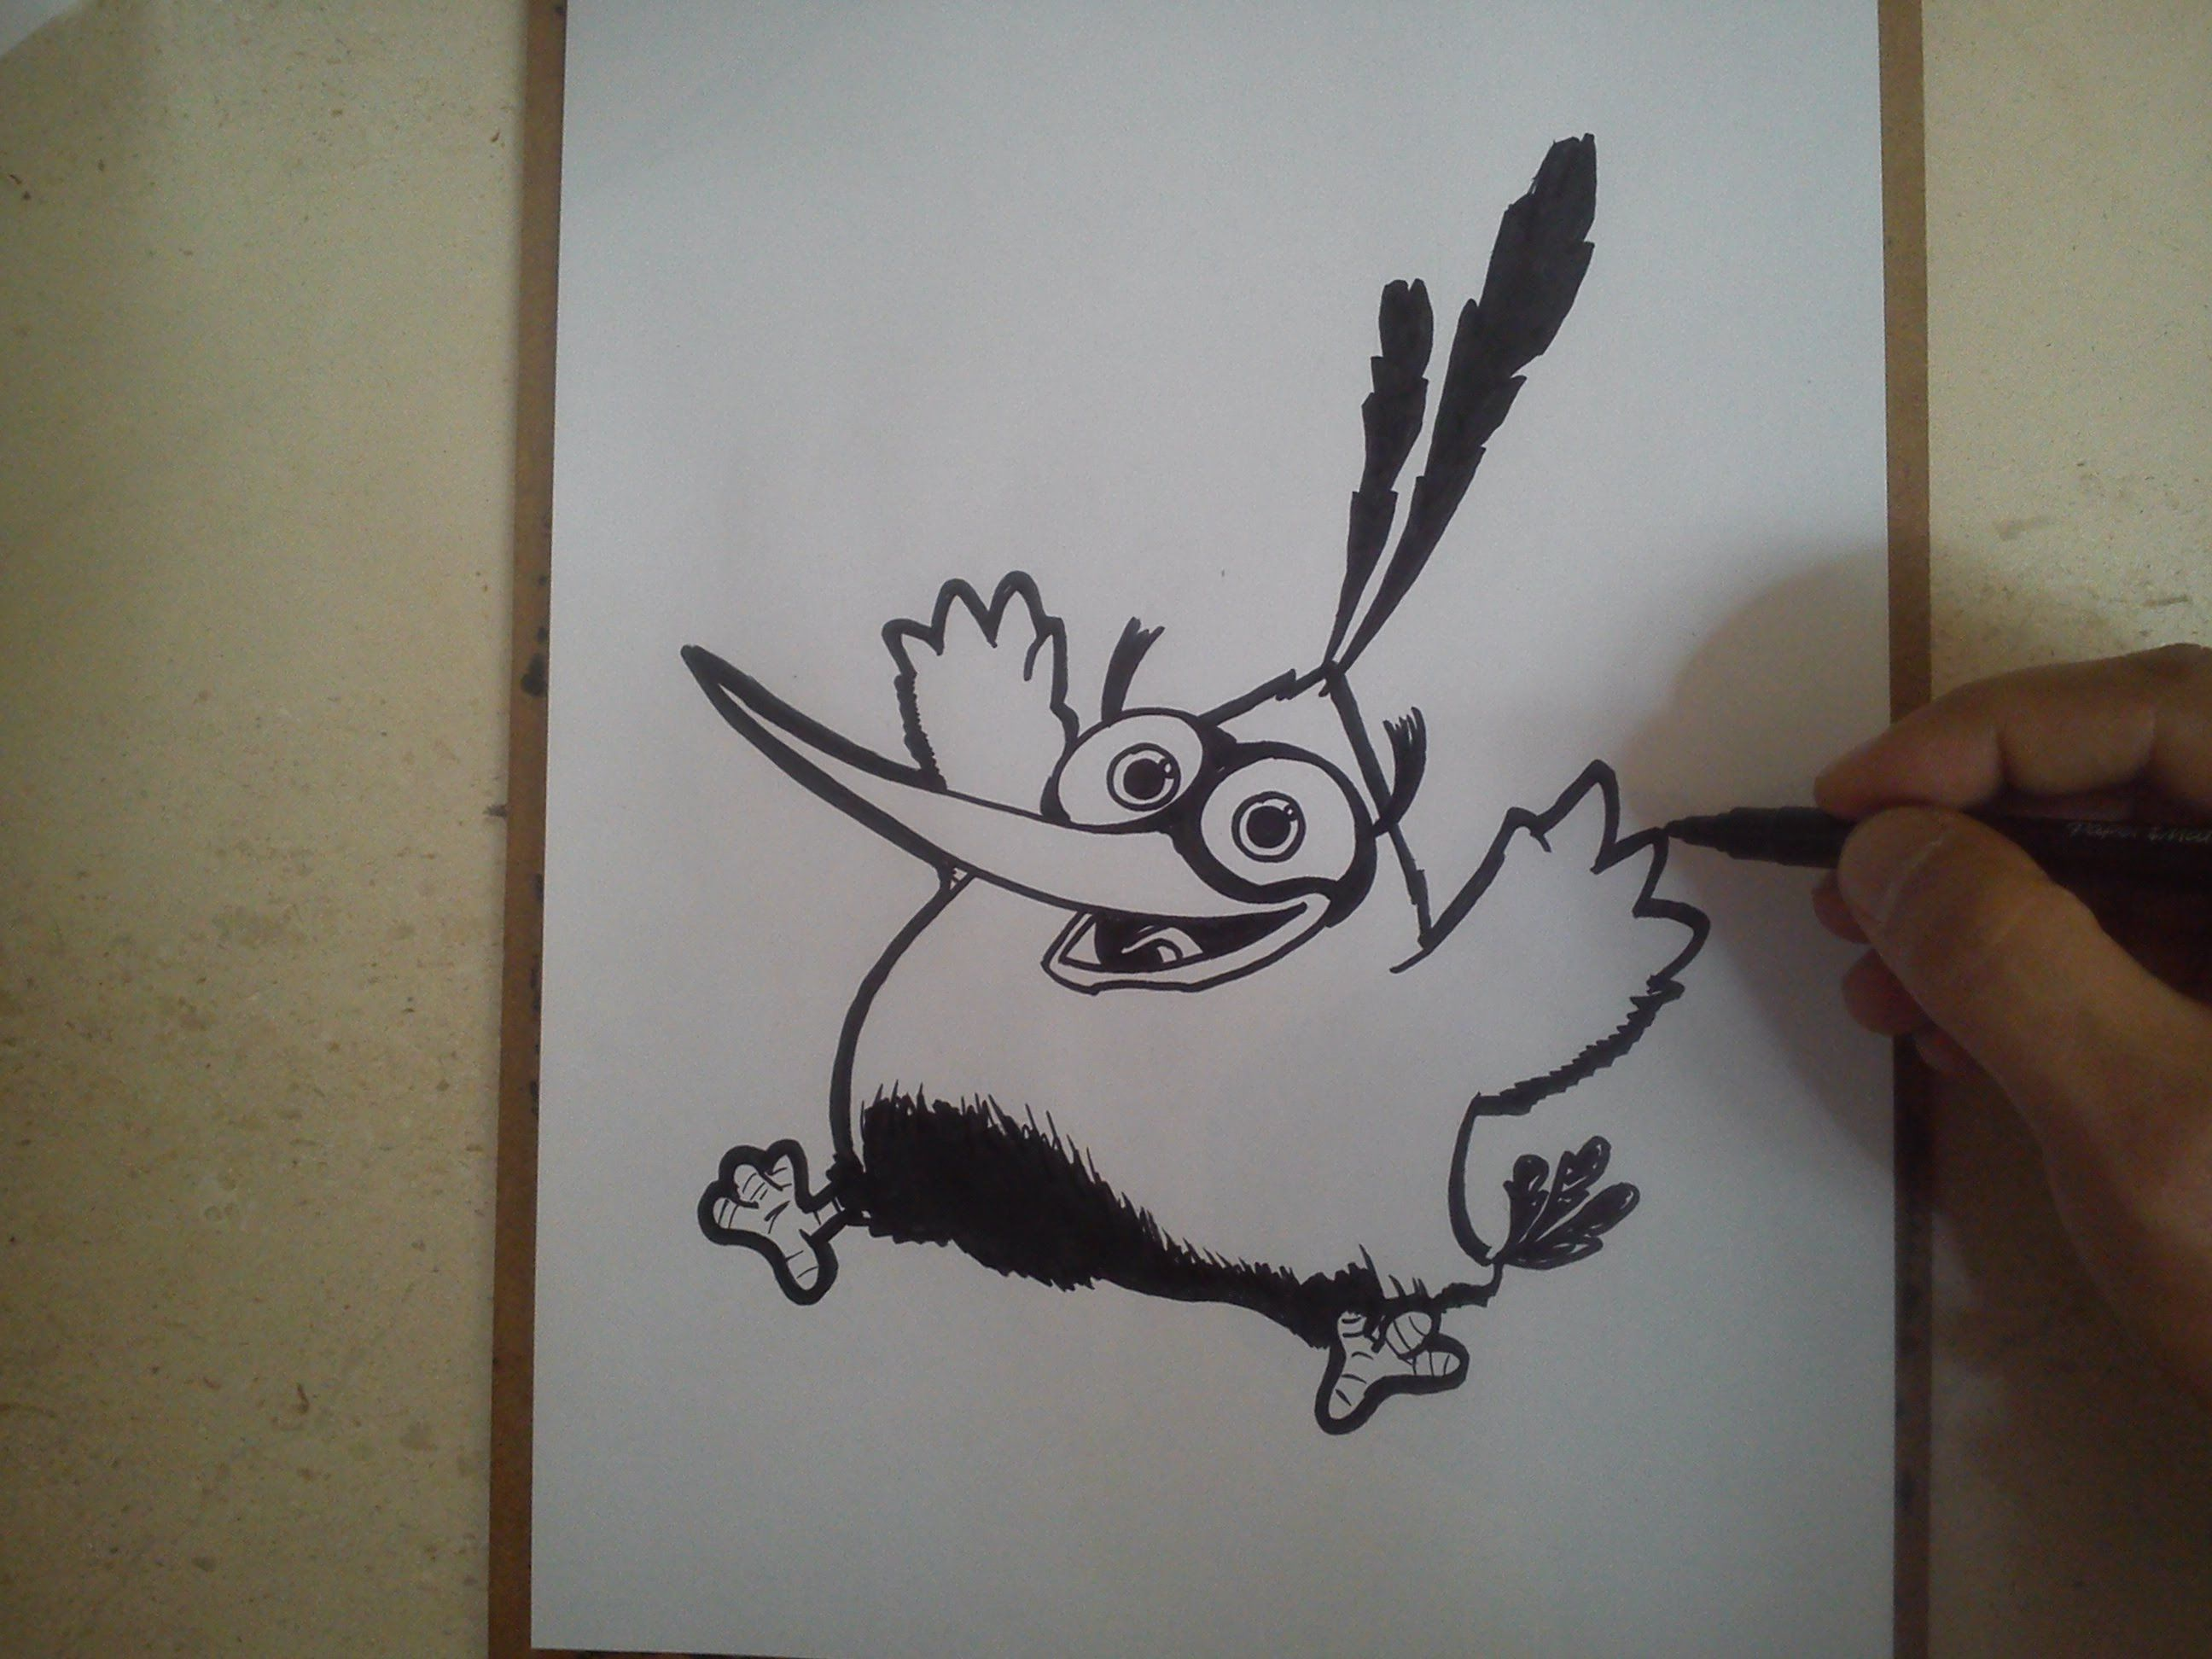 Famoso Páginas De Guerras De Aves Enojadas Para Colorear Colección ...